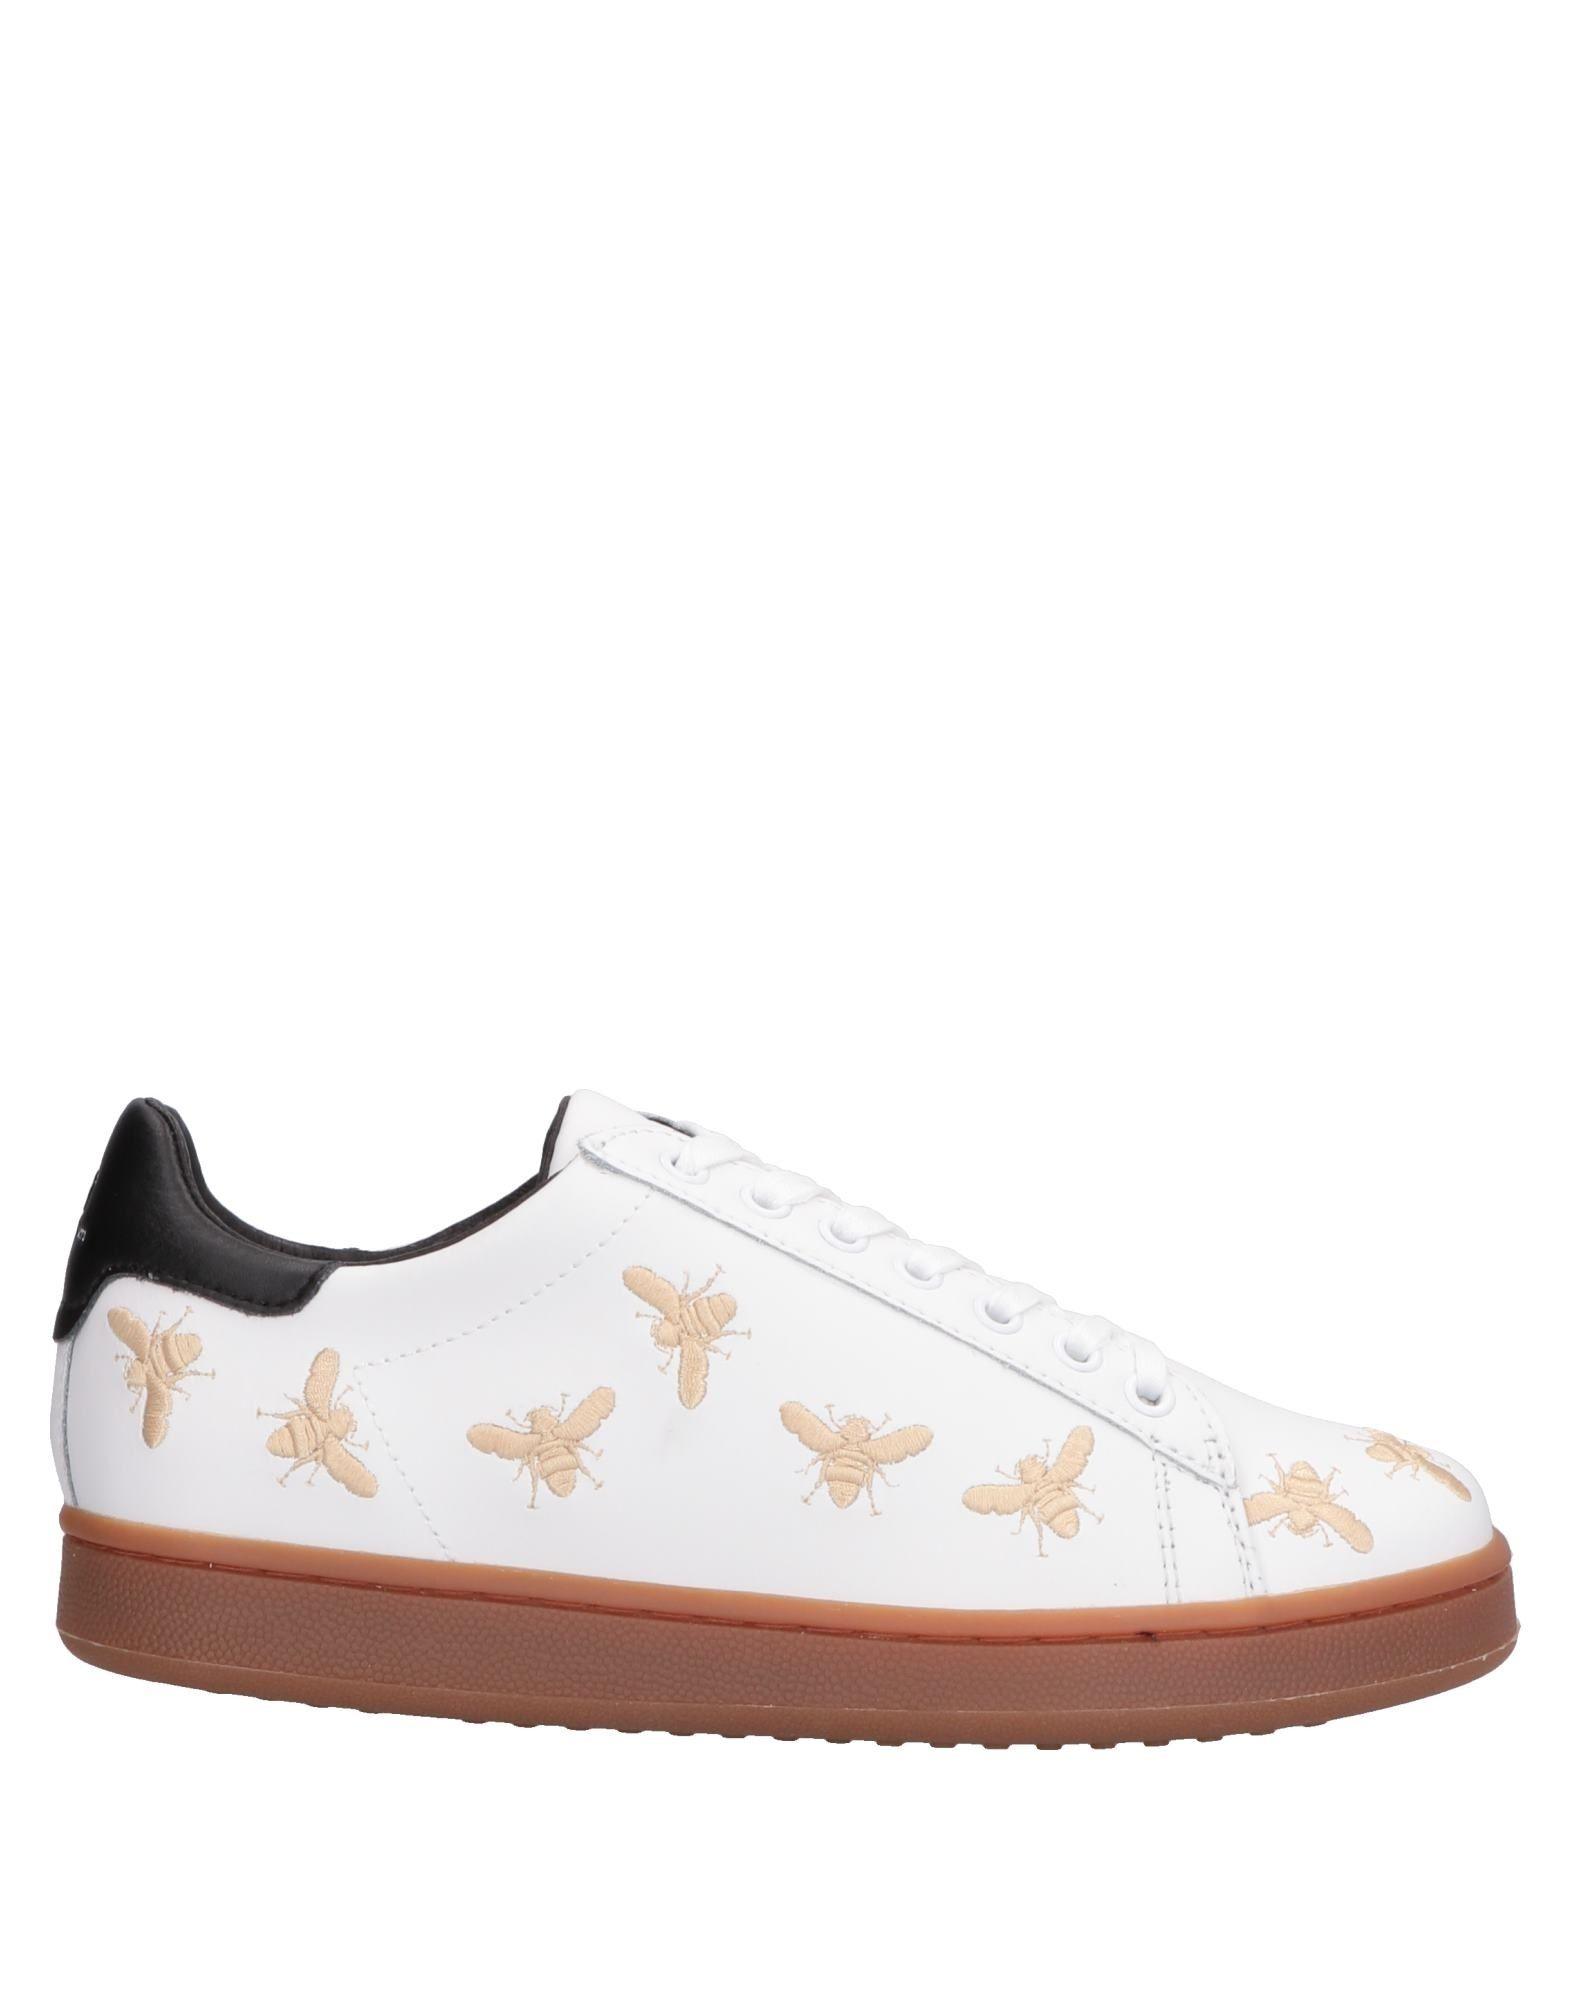 Stilvolle billige Schuhe Sneakers Moa Master Of Arts Sneakers Schuhe Damen  11580265HK 00d60c